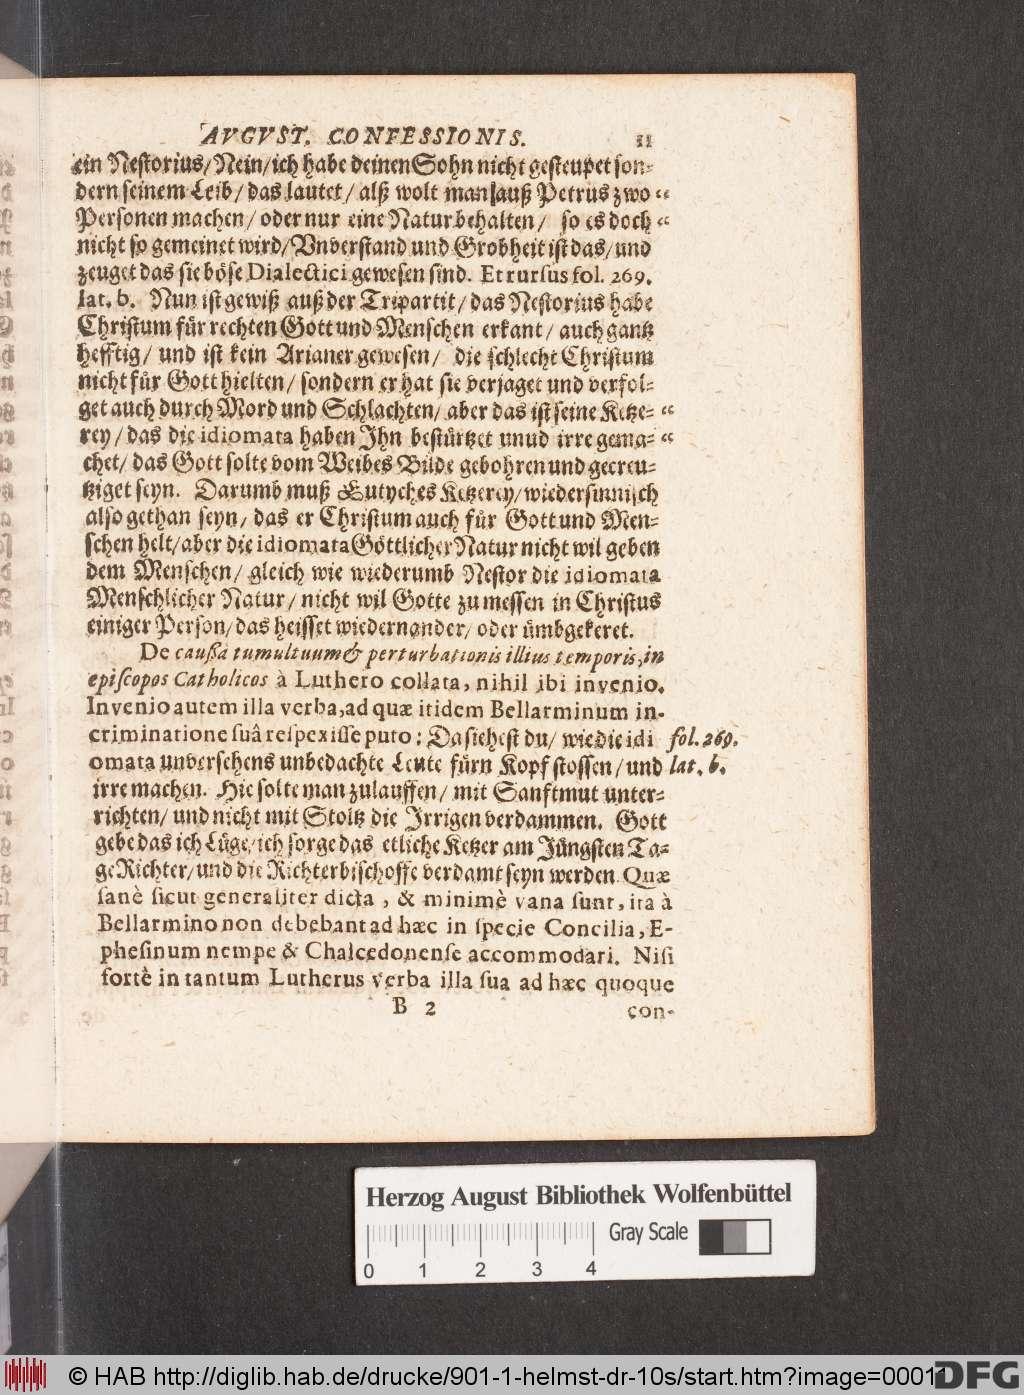 http://diglib.hab.de/drucke/901-1-helmst-dr-10s/00011.jpg